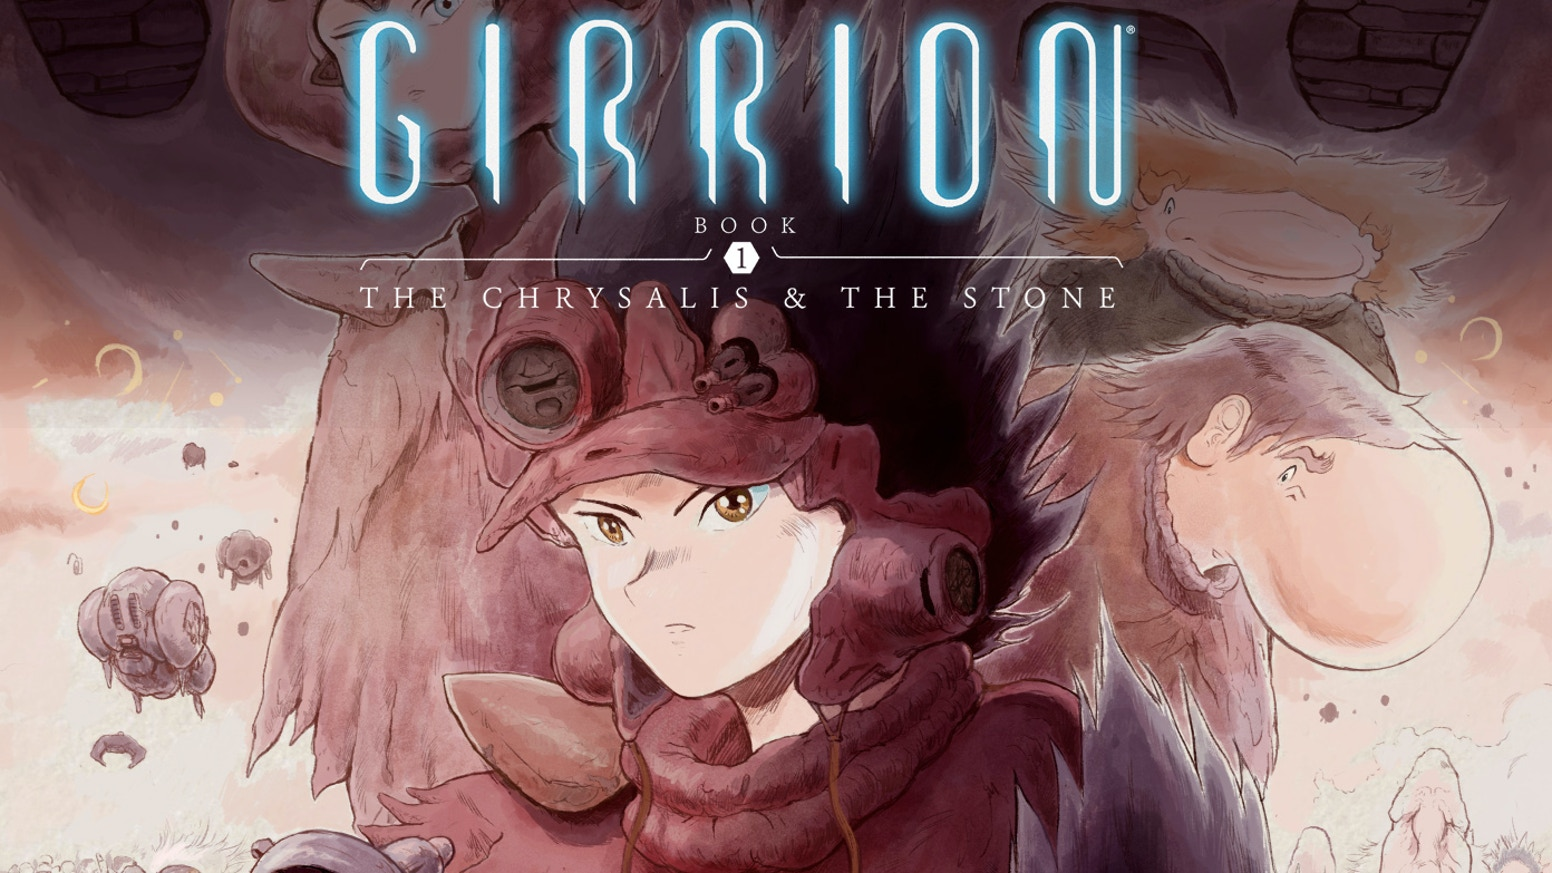 A Sci-fi Fantasy Graphic Novel